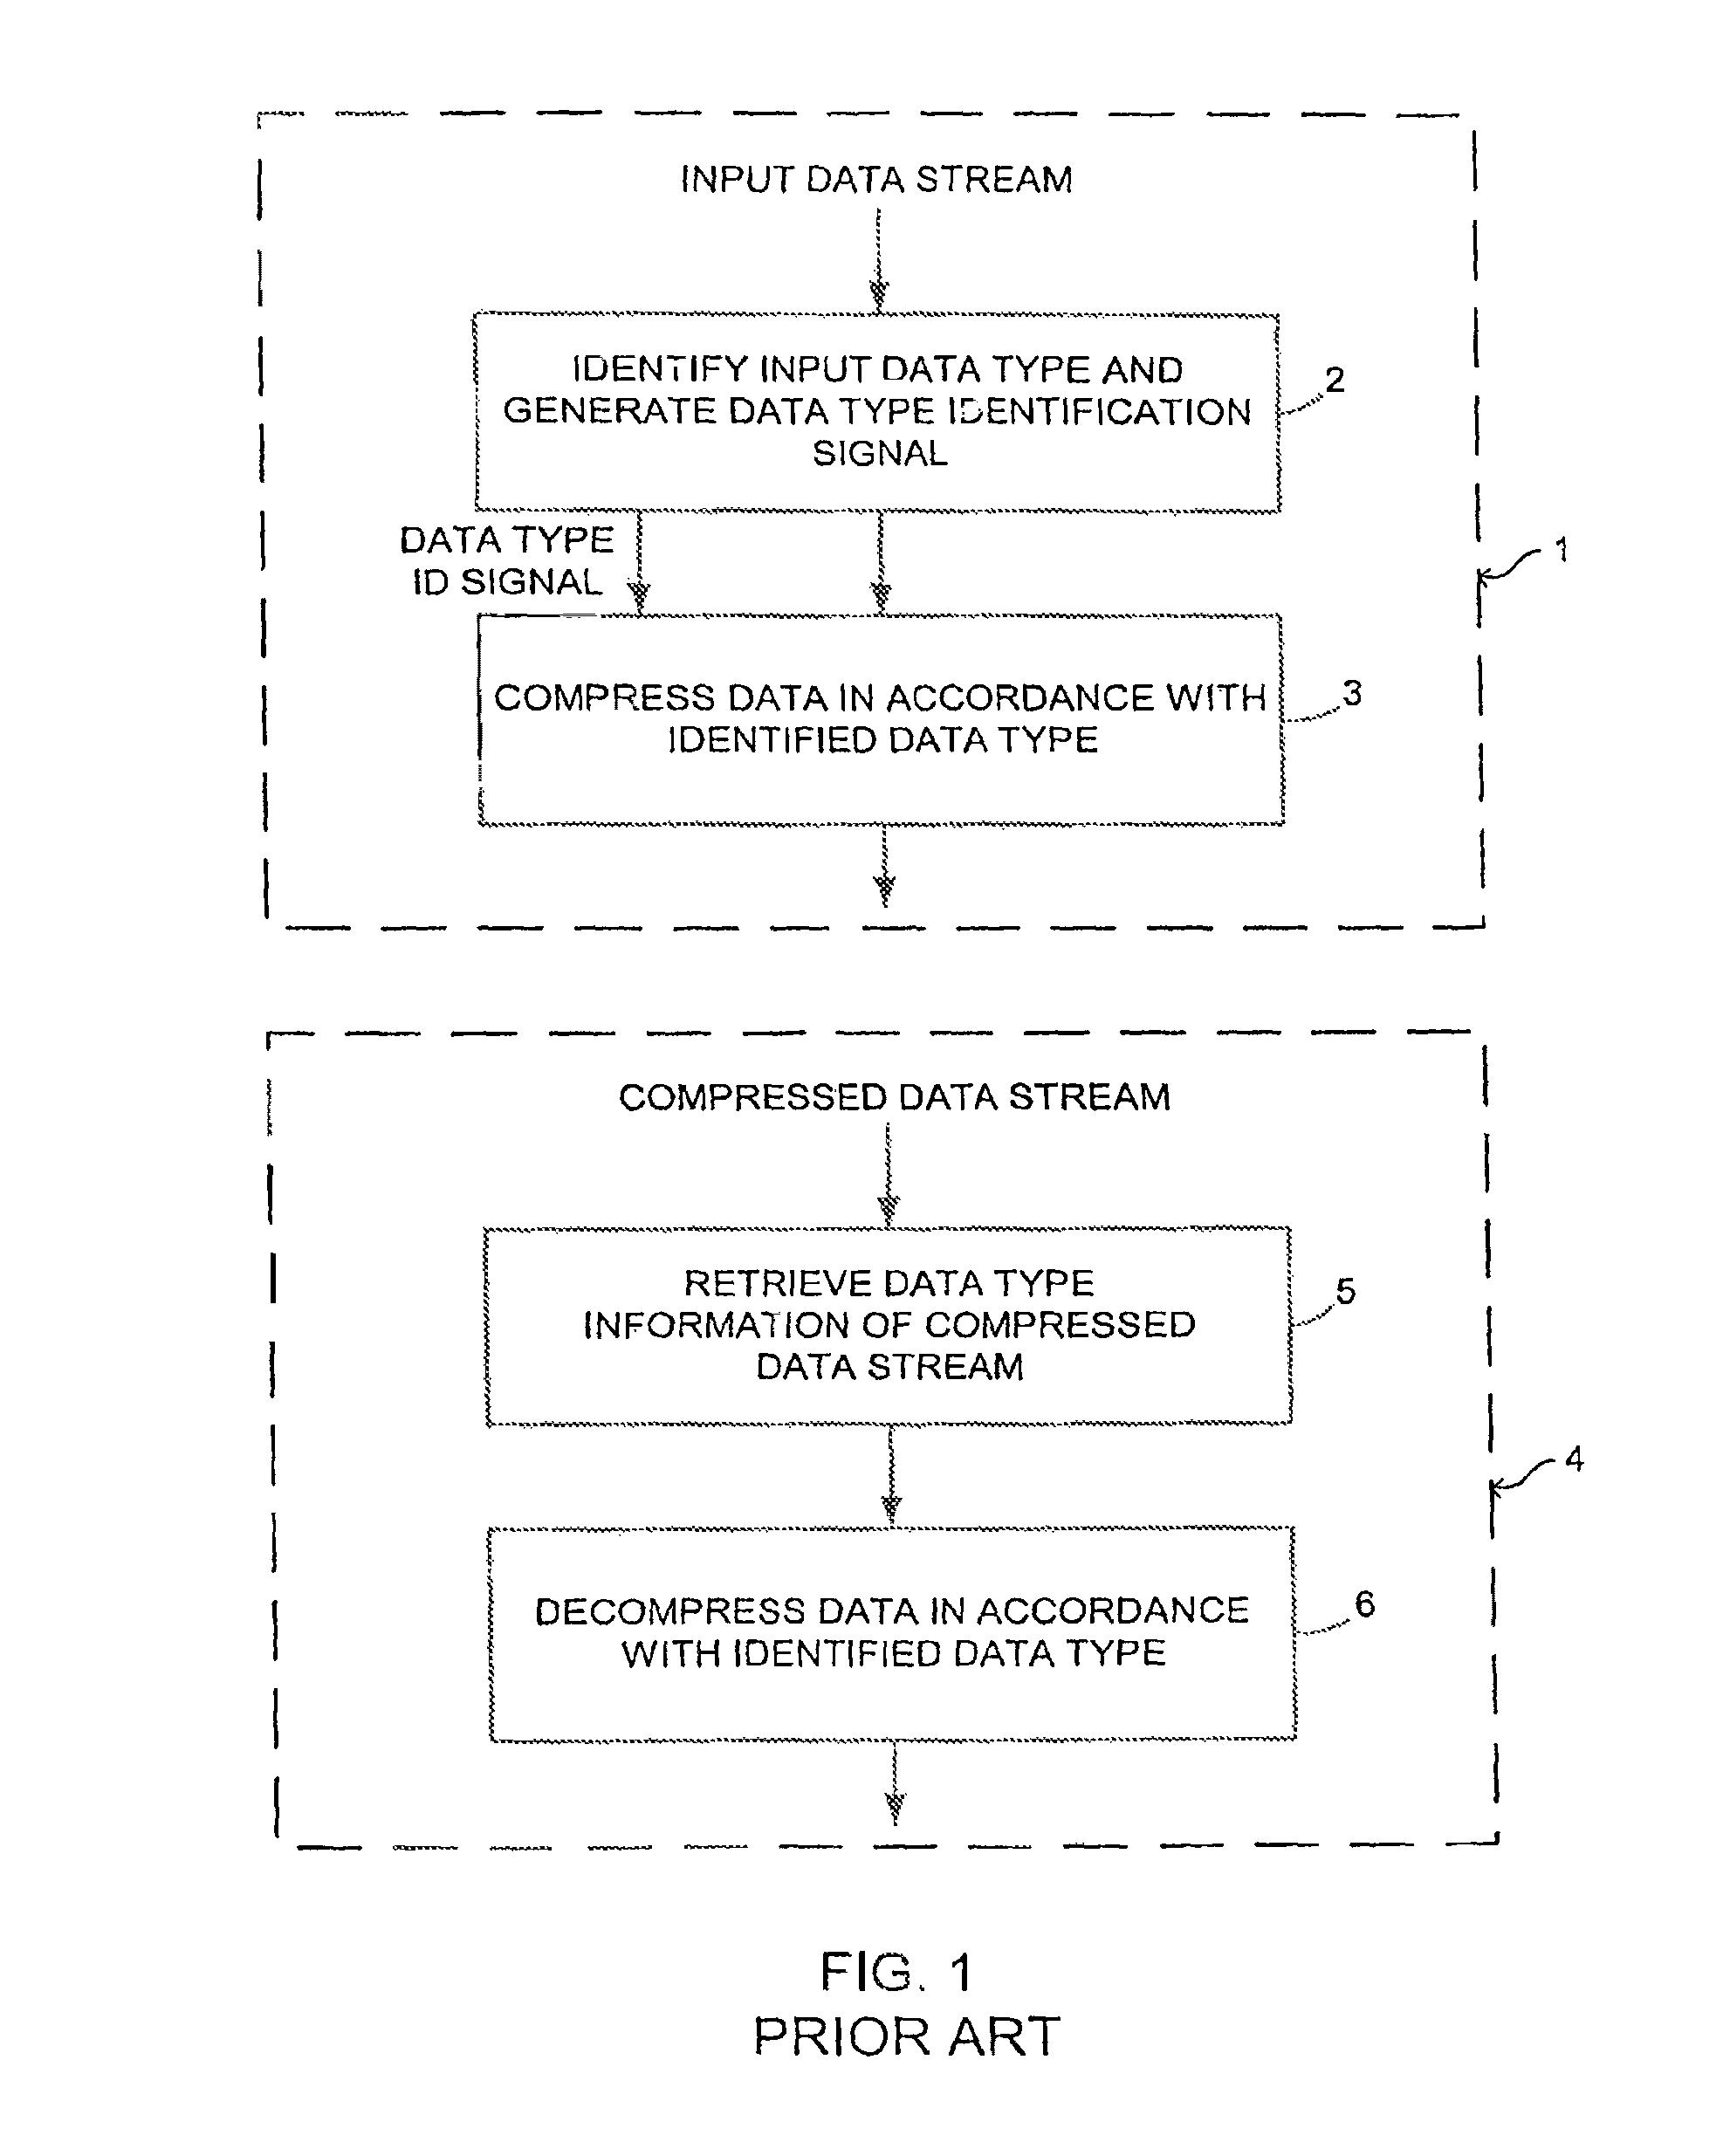 Patent US 9,054,728 B2